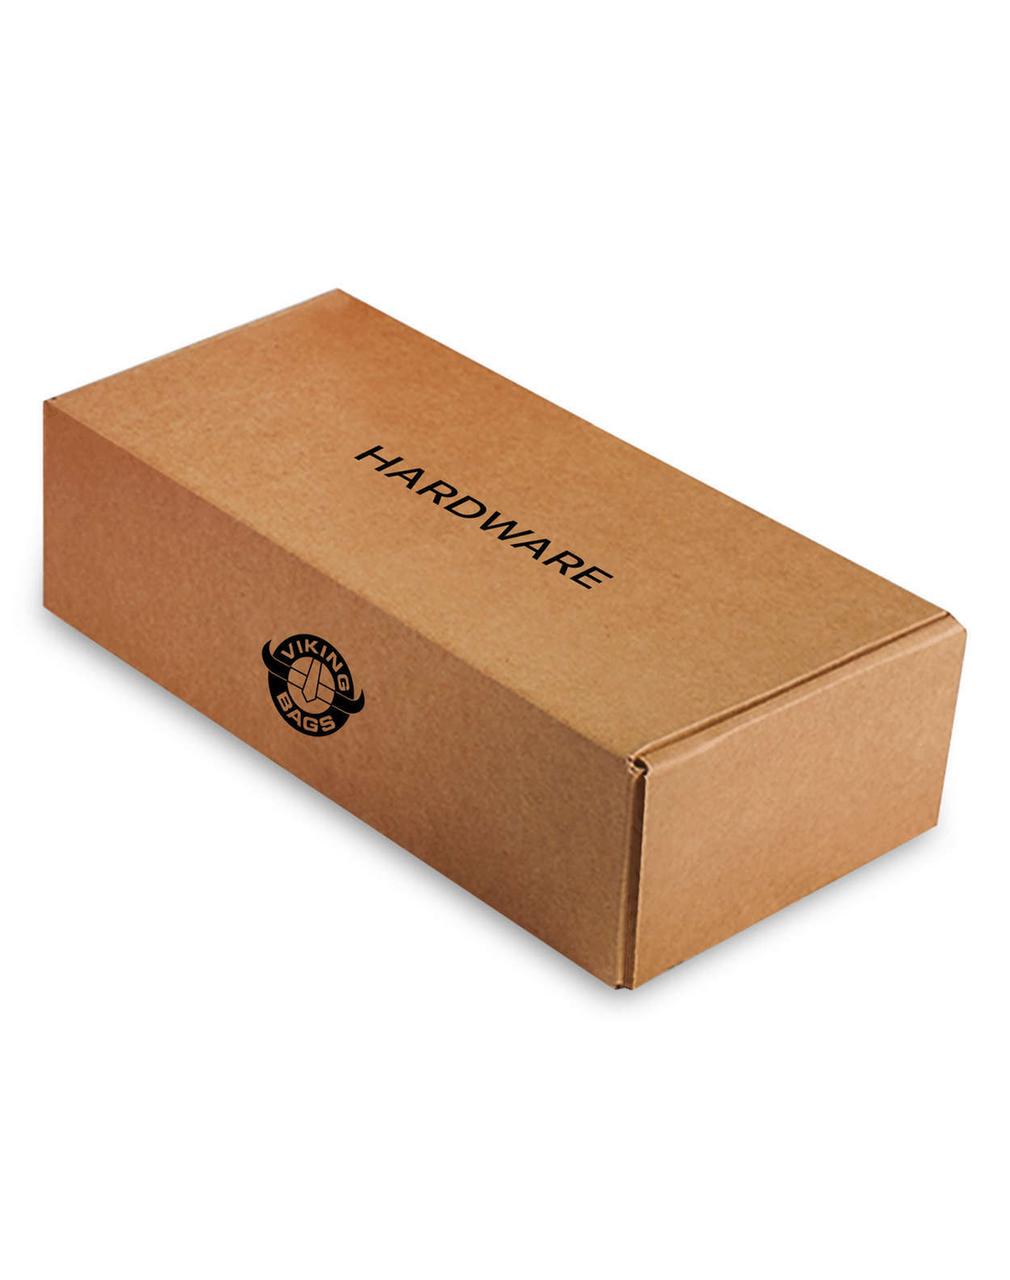 Honda Magna 750 Side Pocket Studded Motorcycle Saddlebags box